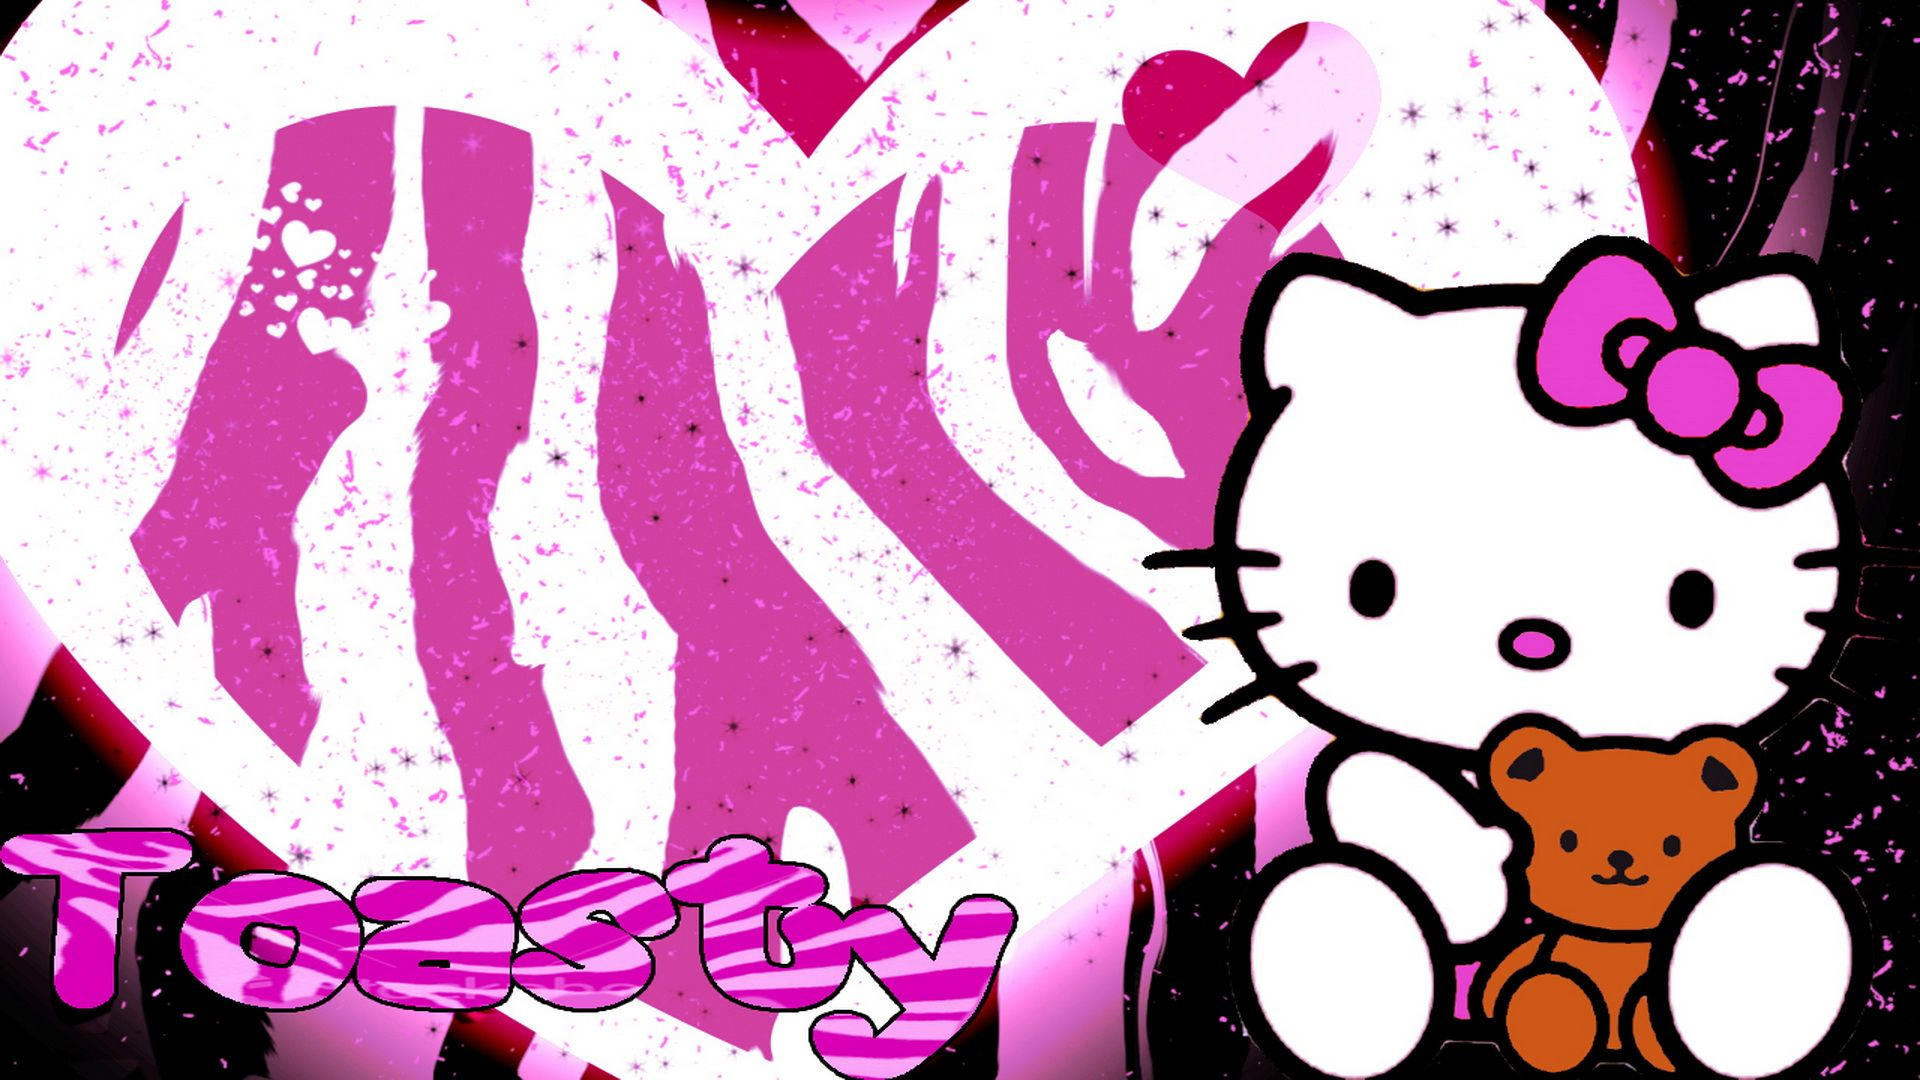 Hello kitty images hello kitty hd wallpaper and background - Hello Kitty Hd Wallpapers 1